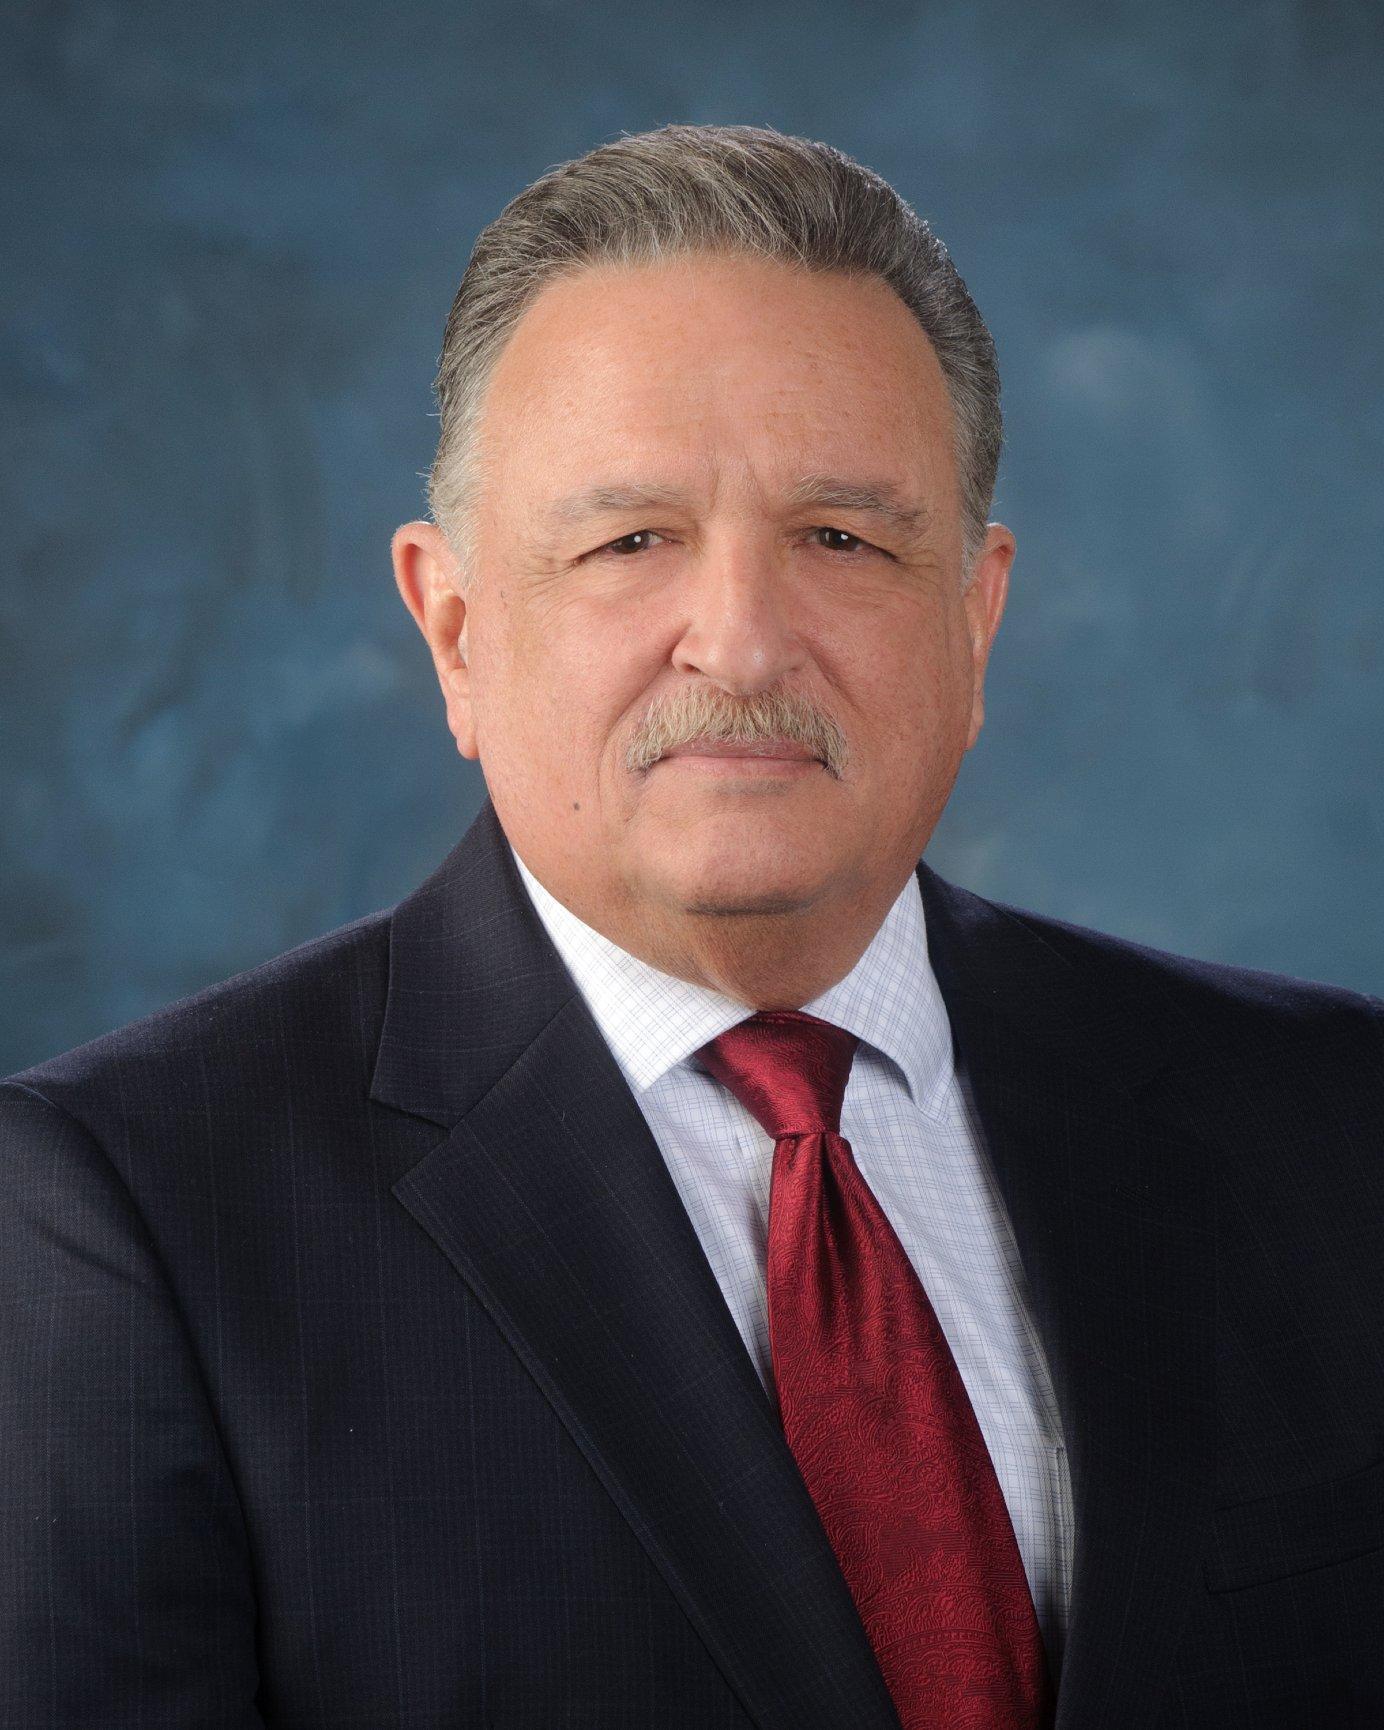 AGUSTIN ALFONSO PASCUAL New York Life Executive Partner